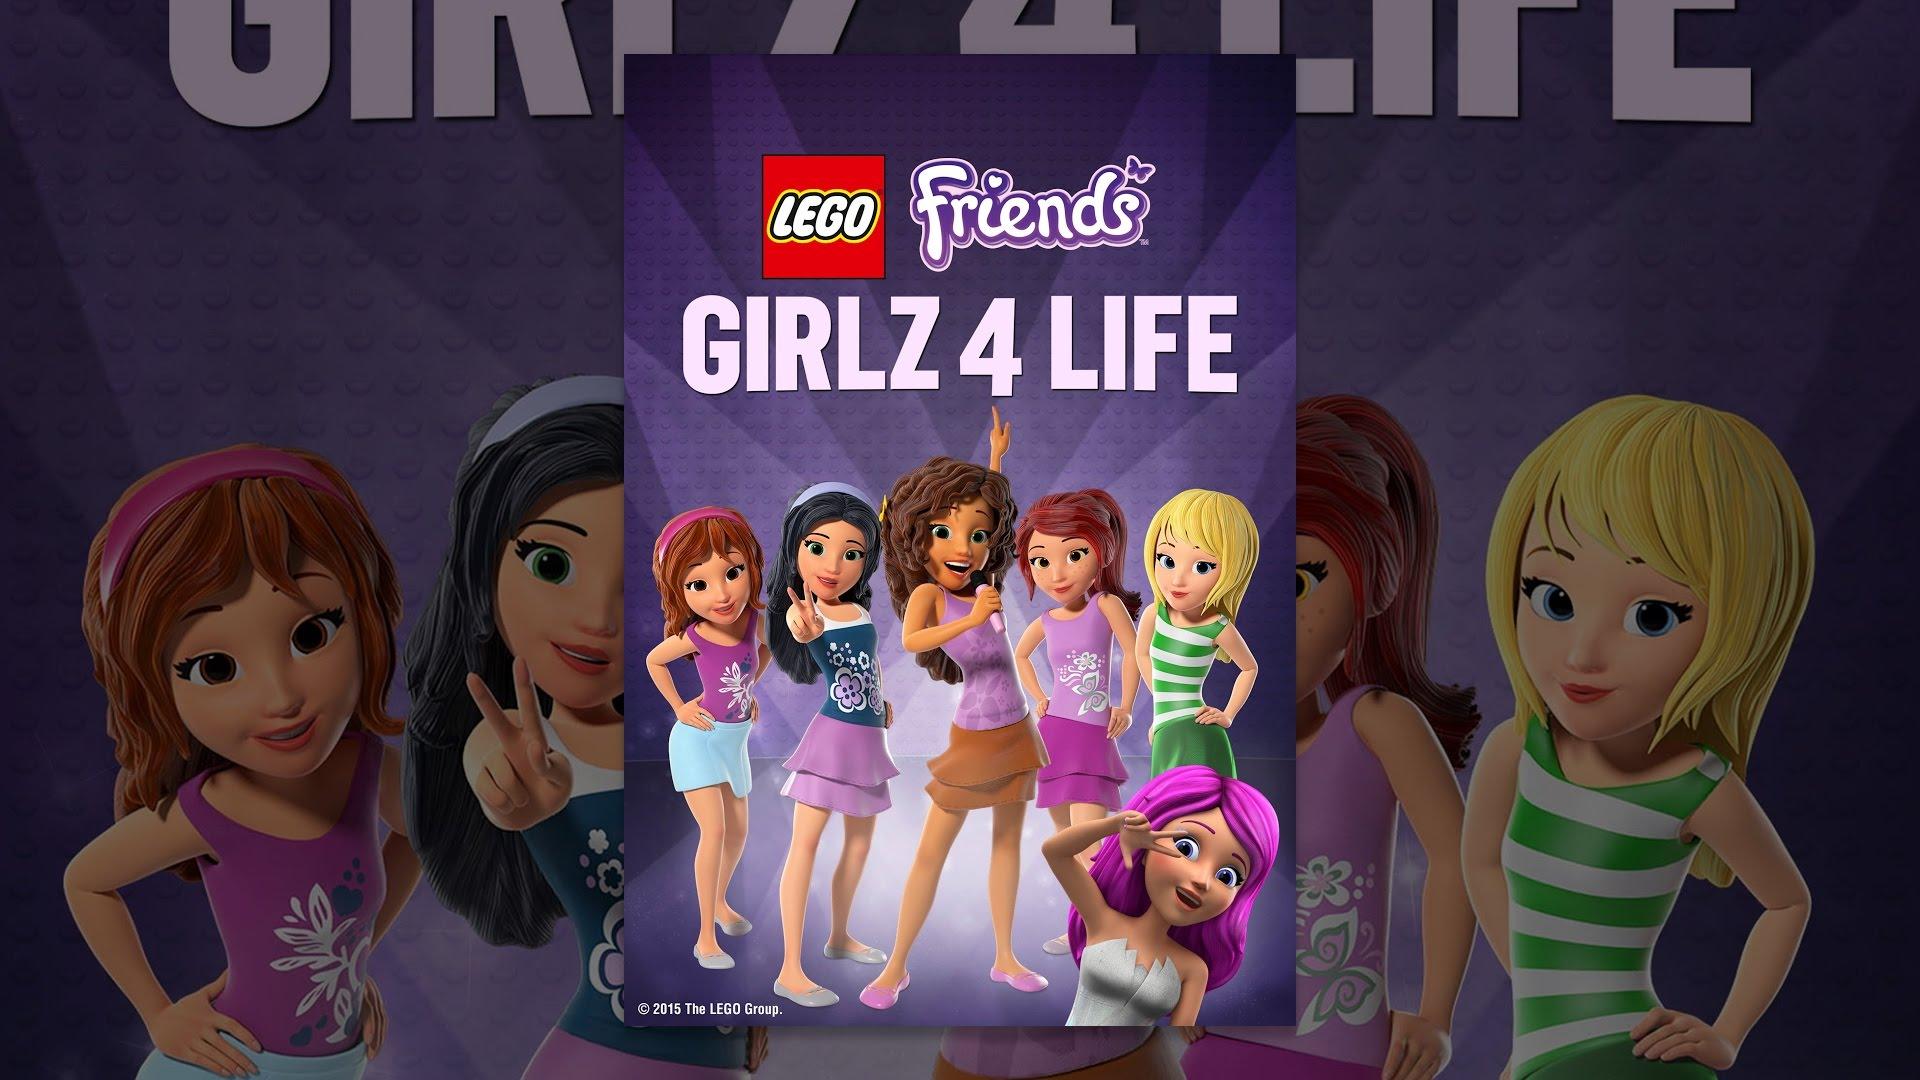 LEGO Friends: Girlz 4 Life (Doblada) - YouTube